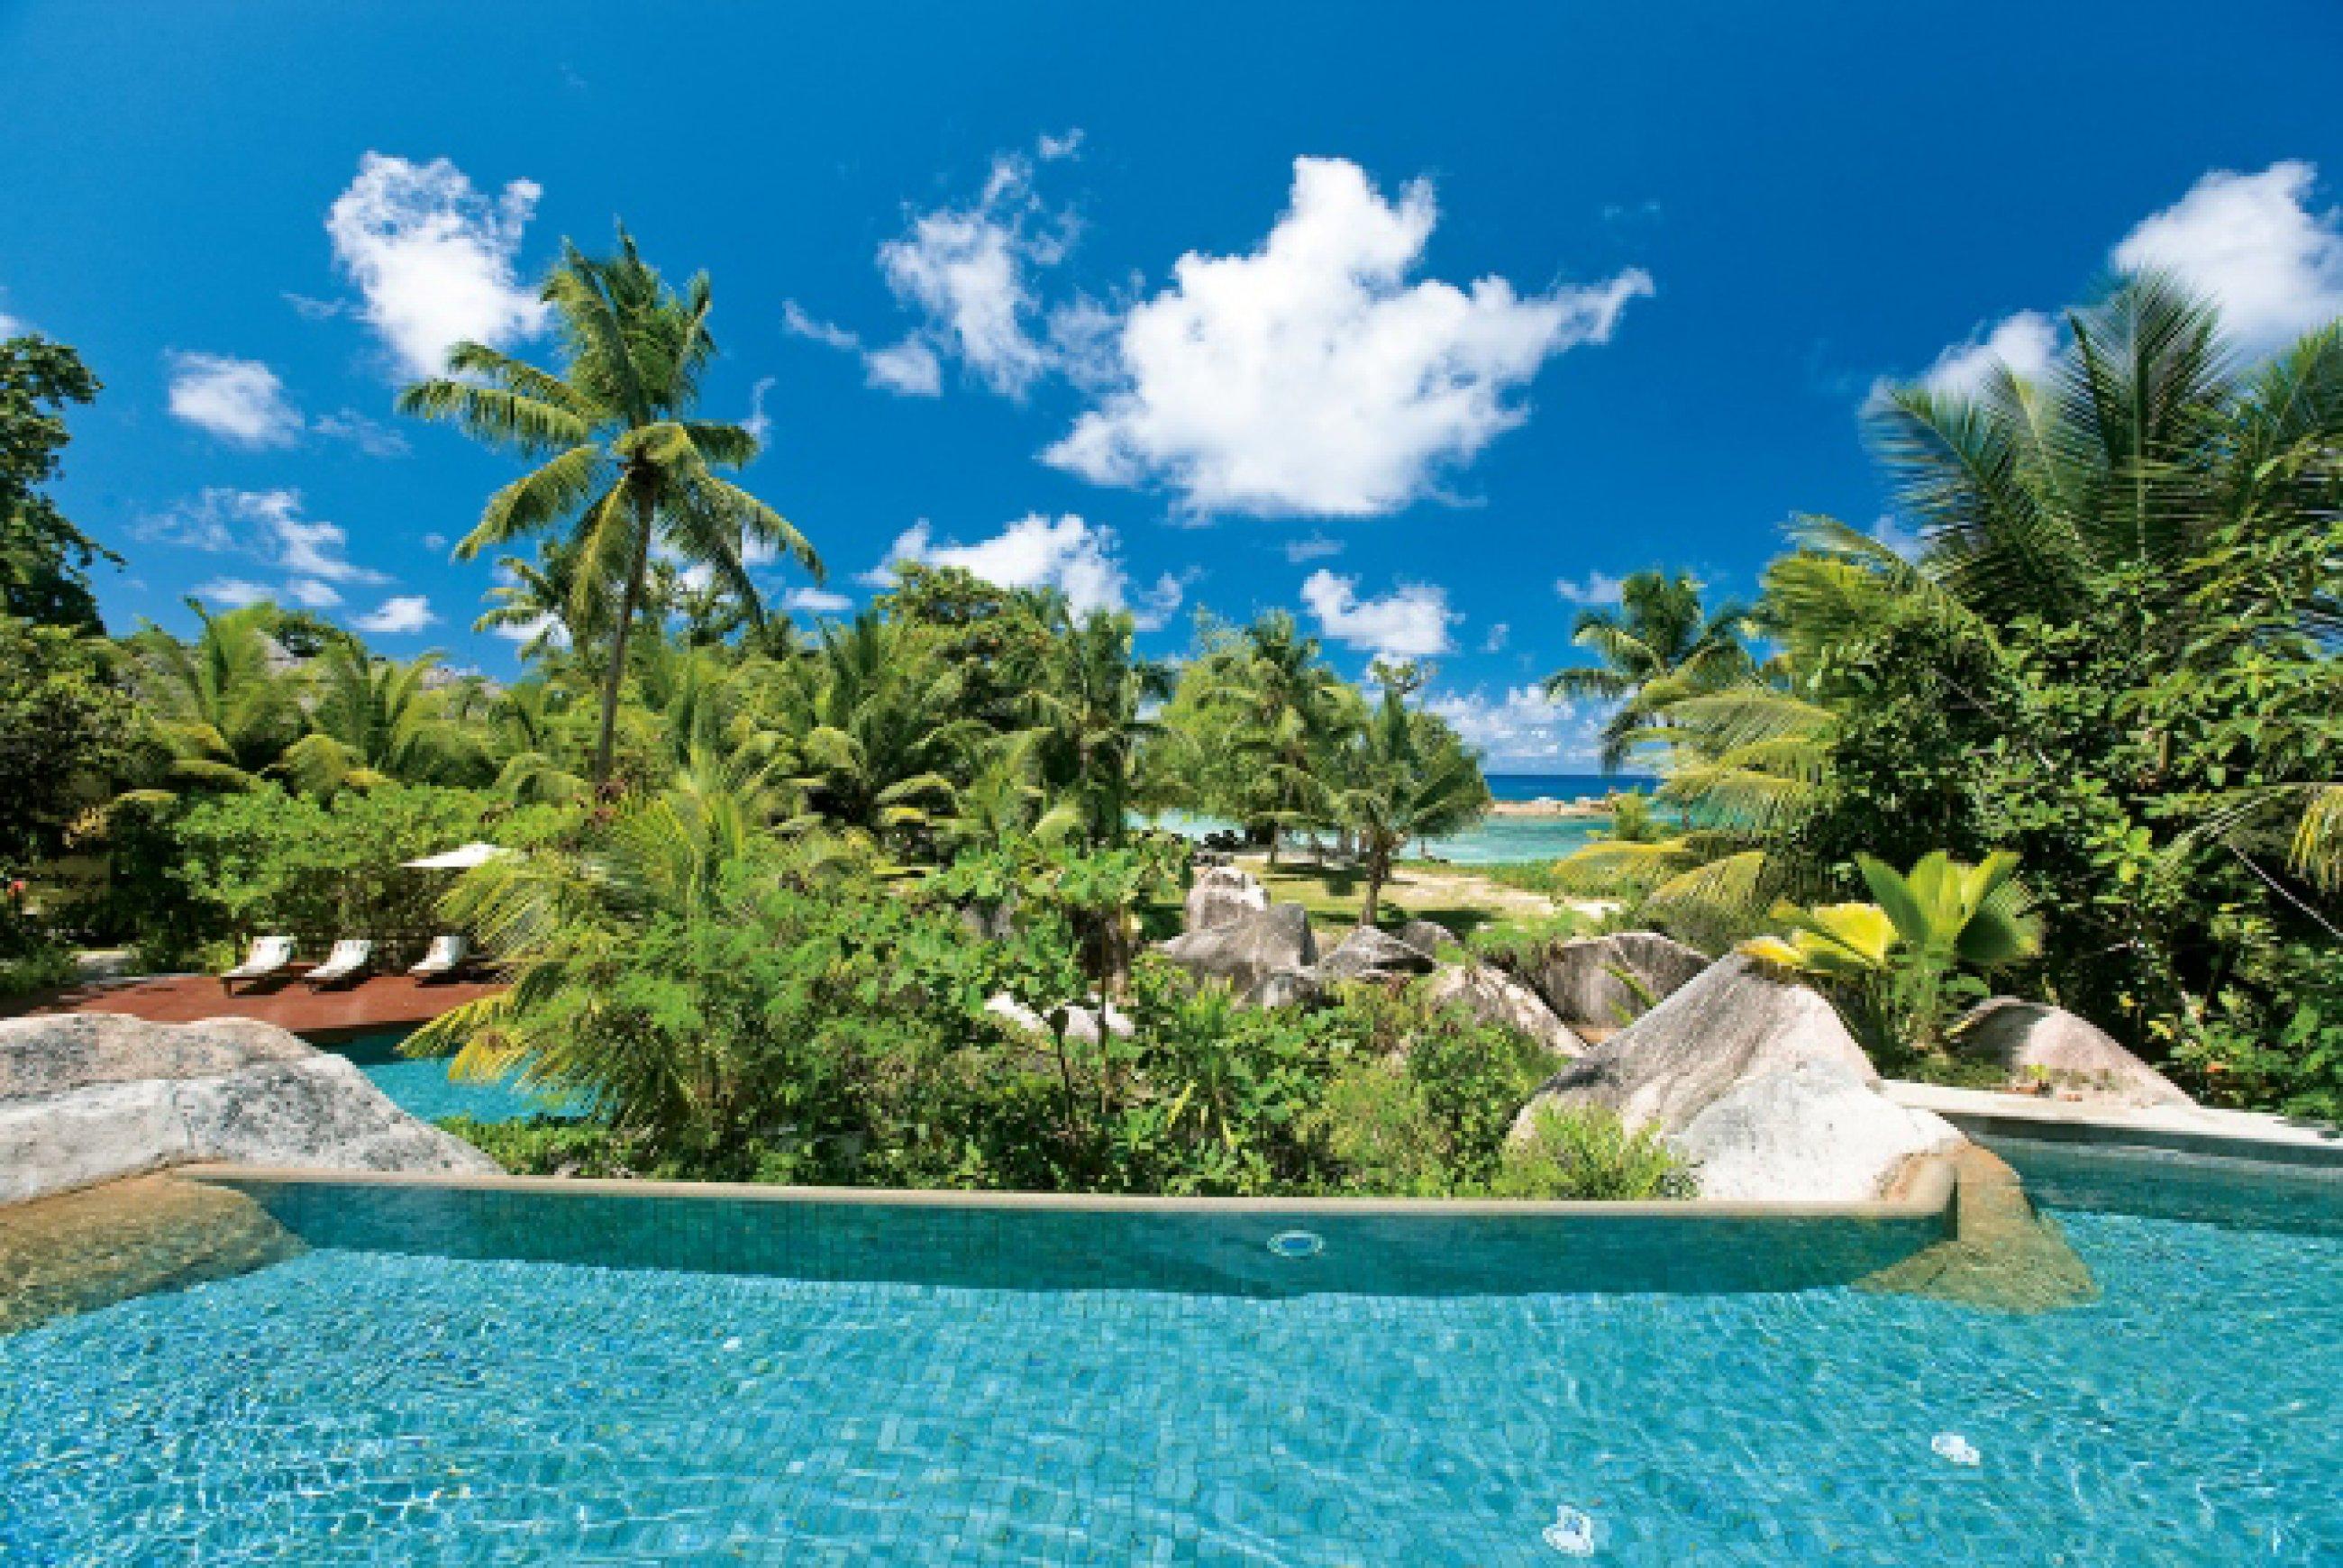 https://bubo.sk/uploads/galleries/16287/lemuria-seychelles-pool-view-10.jpg